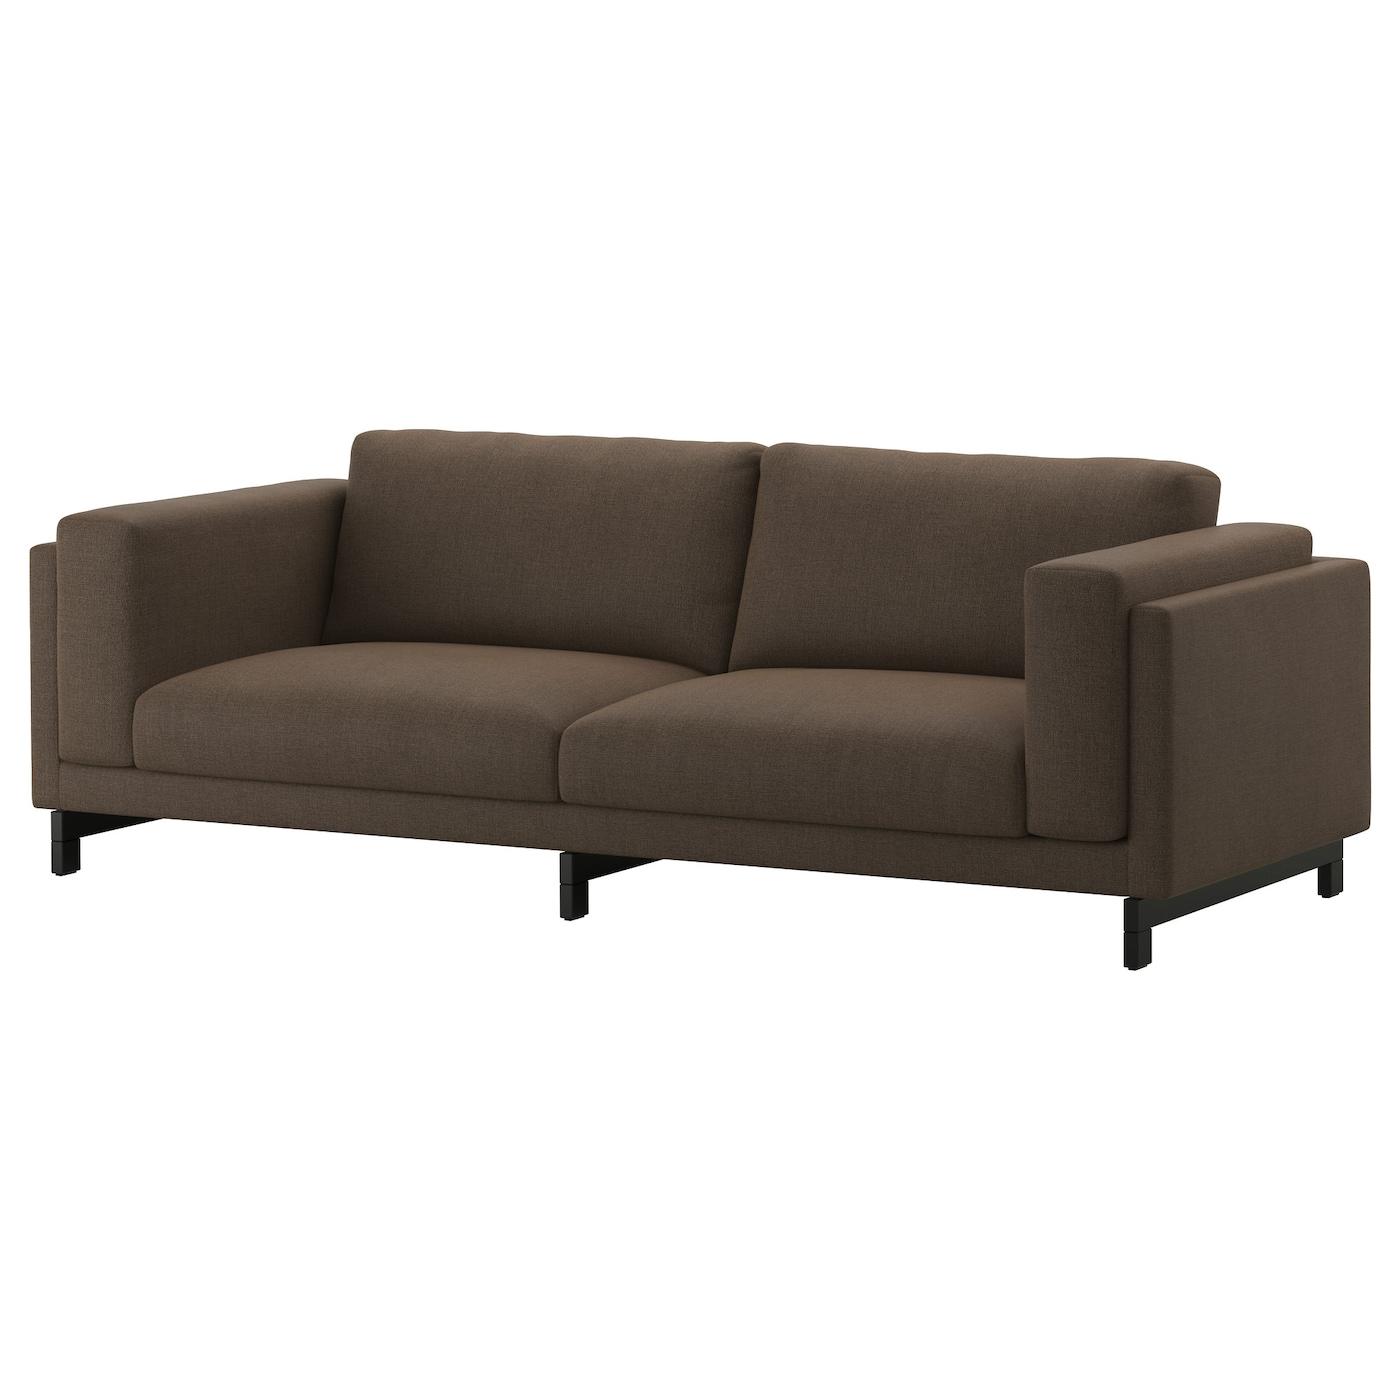 Nockeby three seat sofa ten brown wood ikea for Sofa nockeby